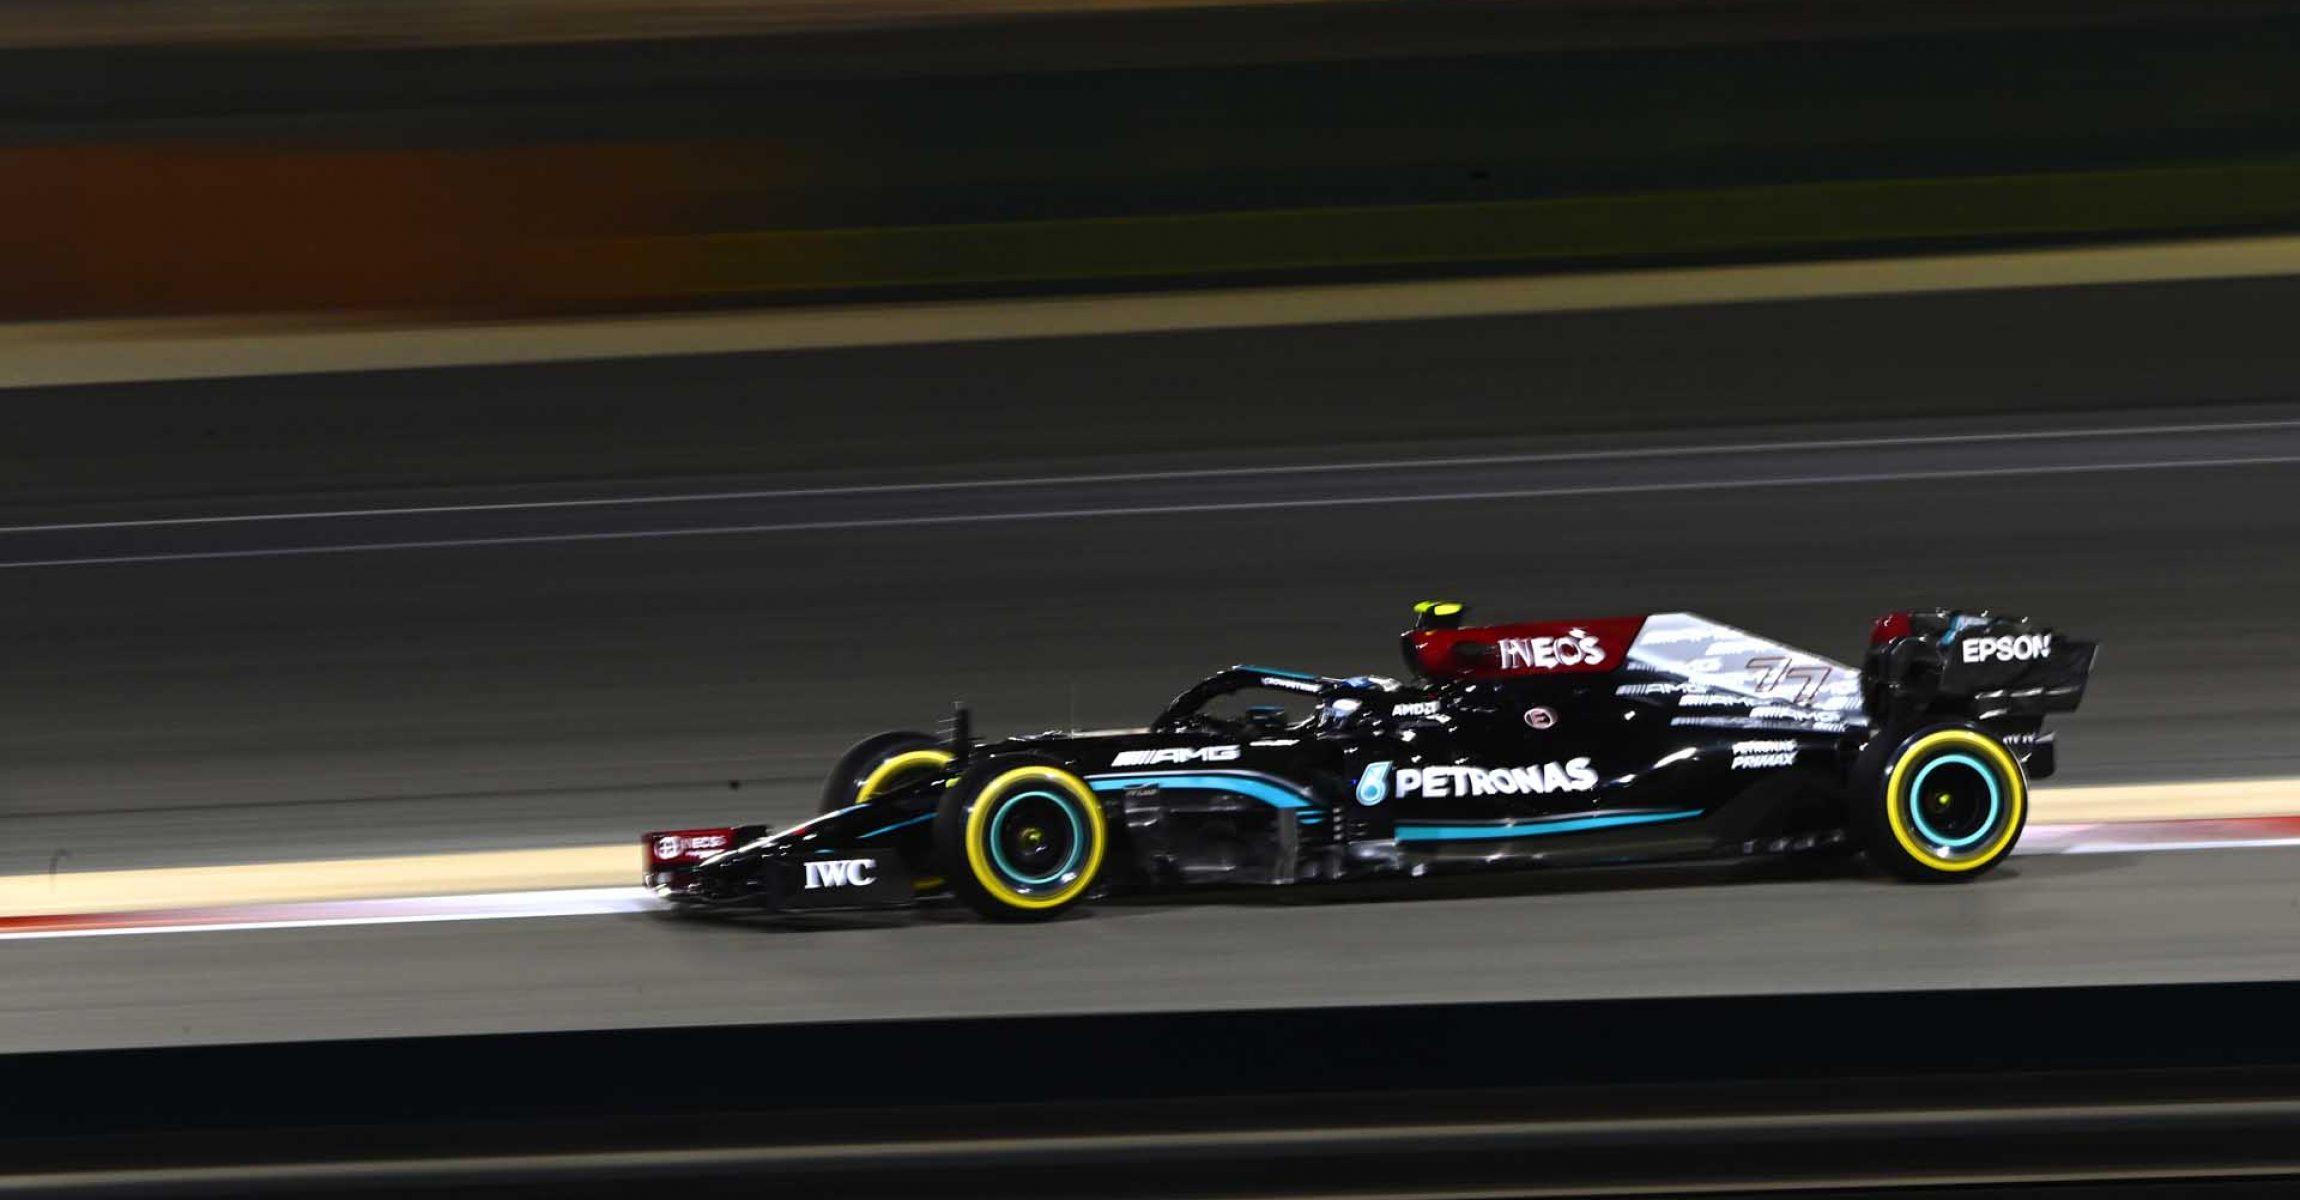 2021 Bahrain Grand Prix, Saturday - LAT Images  Valtteri Bottas Mercedes